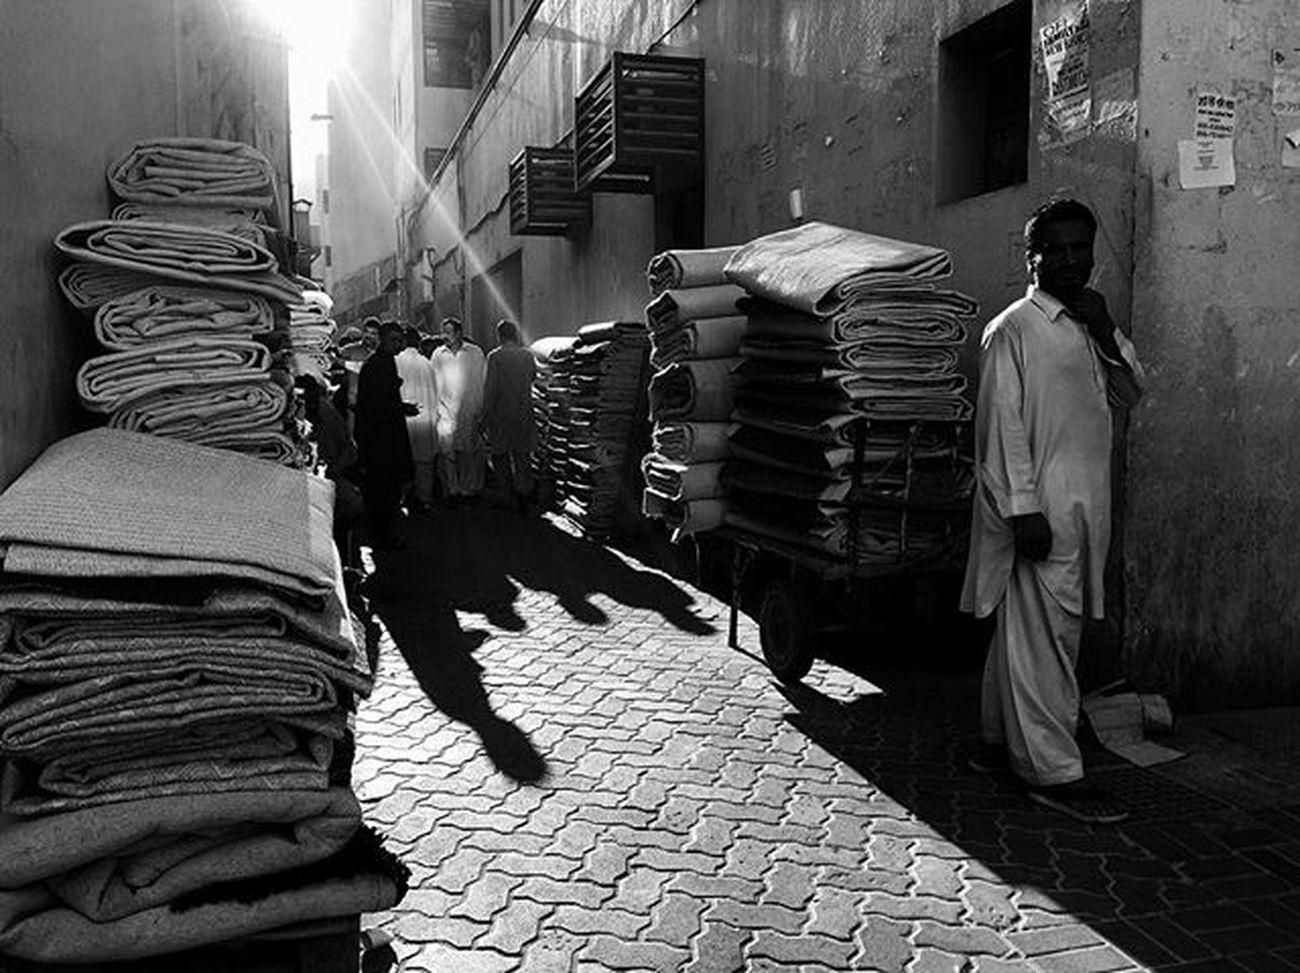 LitratistaSaDaan Daandxb Dubaistreet Naif Deiradubai Streetphotography NaifscenebyDay Blackandwhitephotography Lightandshadow Bnw_worldwide Streettogs SP PW